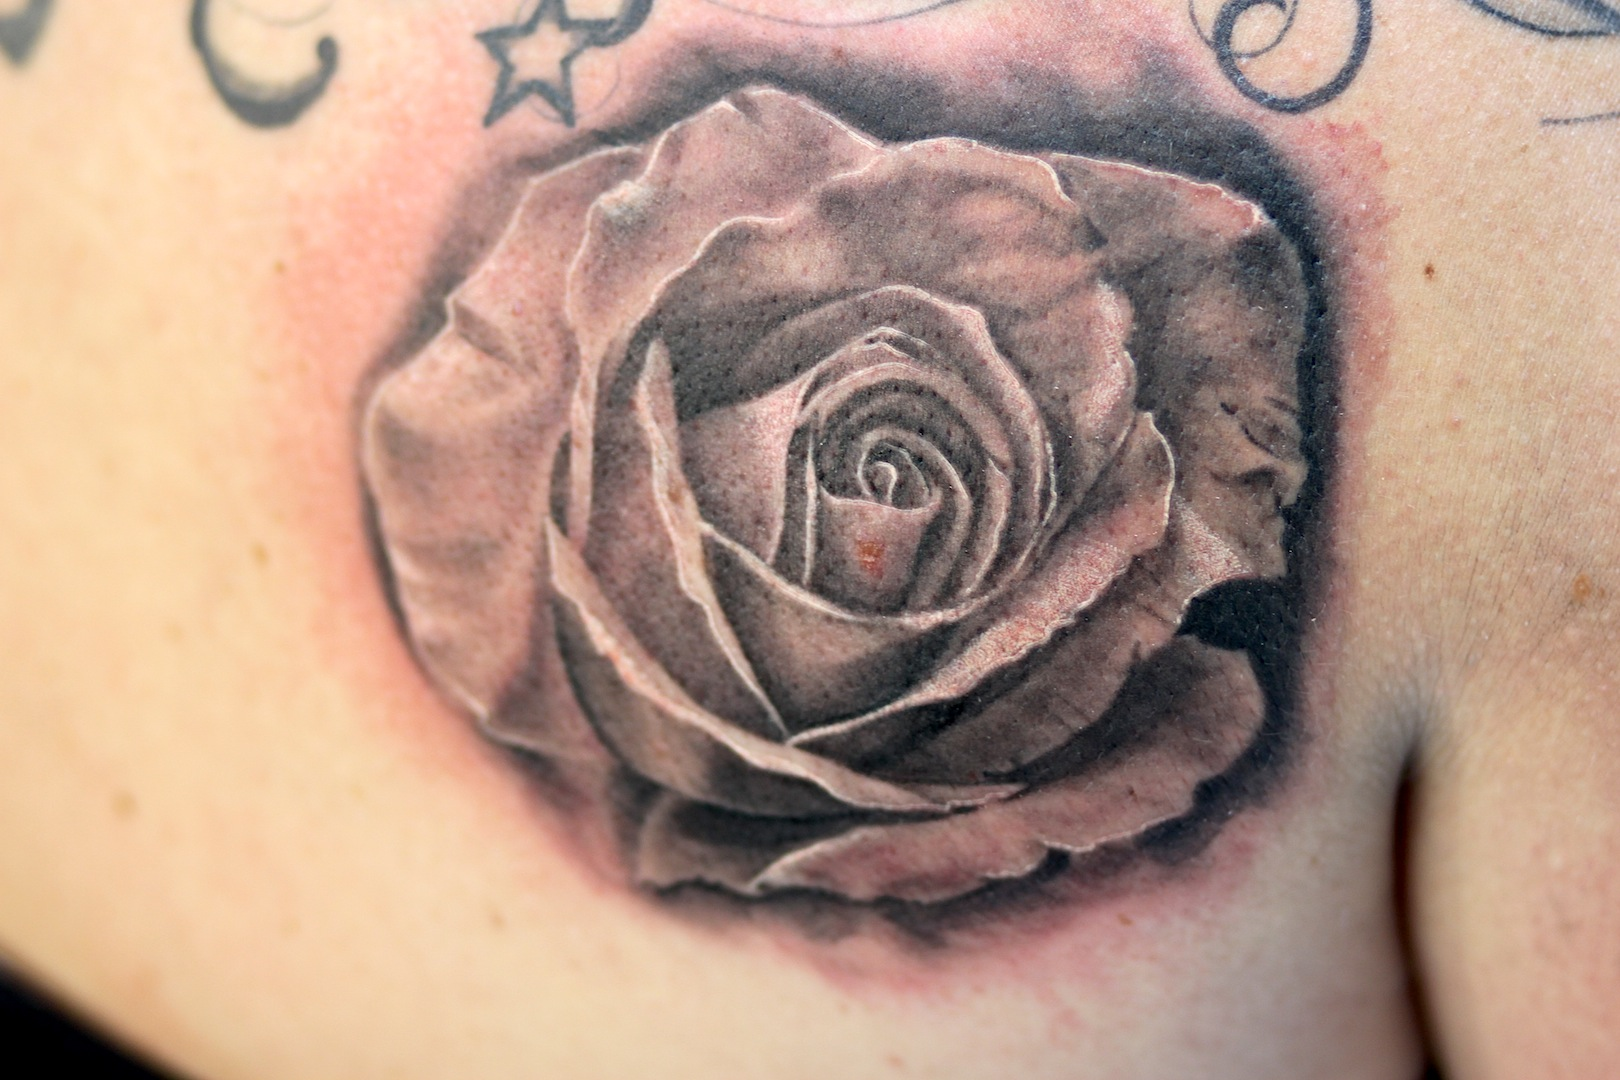 electrographic,tattoo,rosenheim.nürnberg tattoo convention sonntag.3